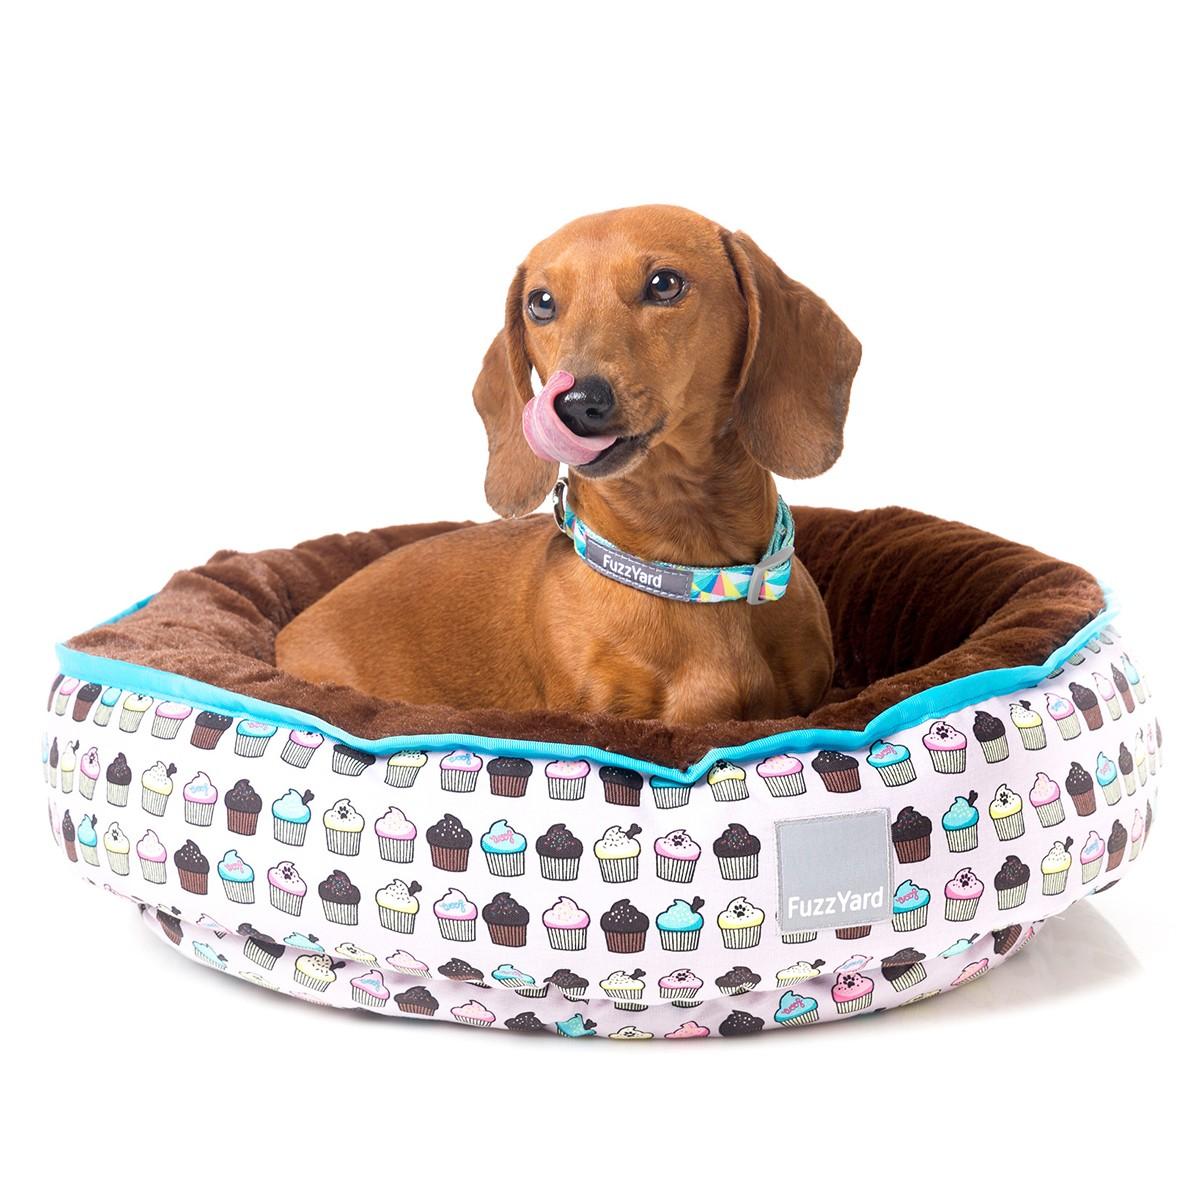 Fuzzyard Cupcakes Reversible Pet Bed Small